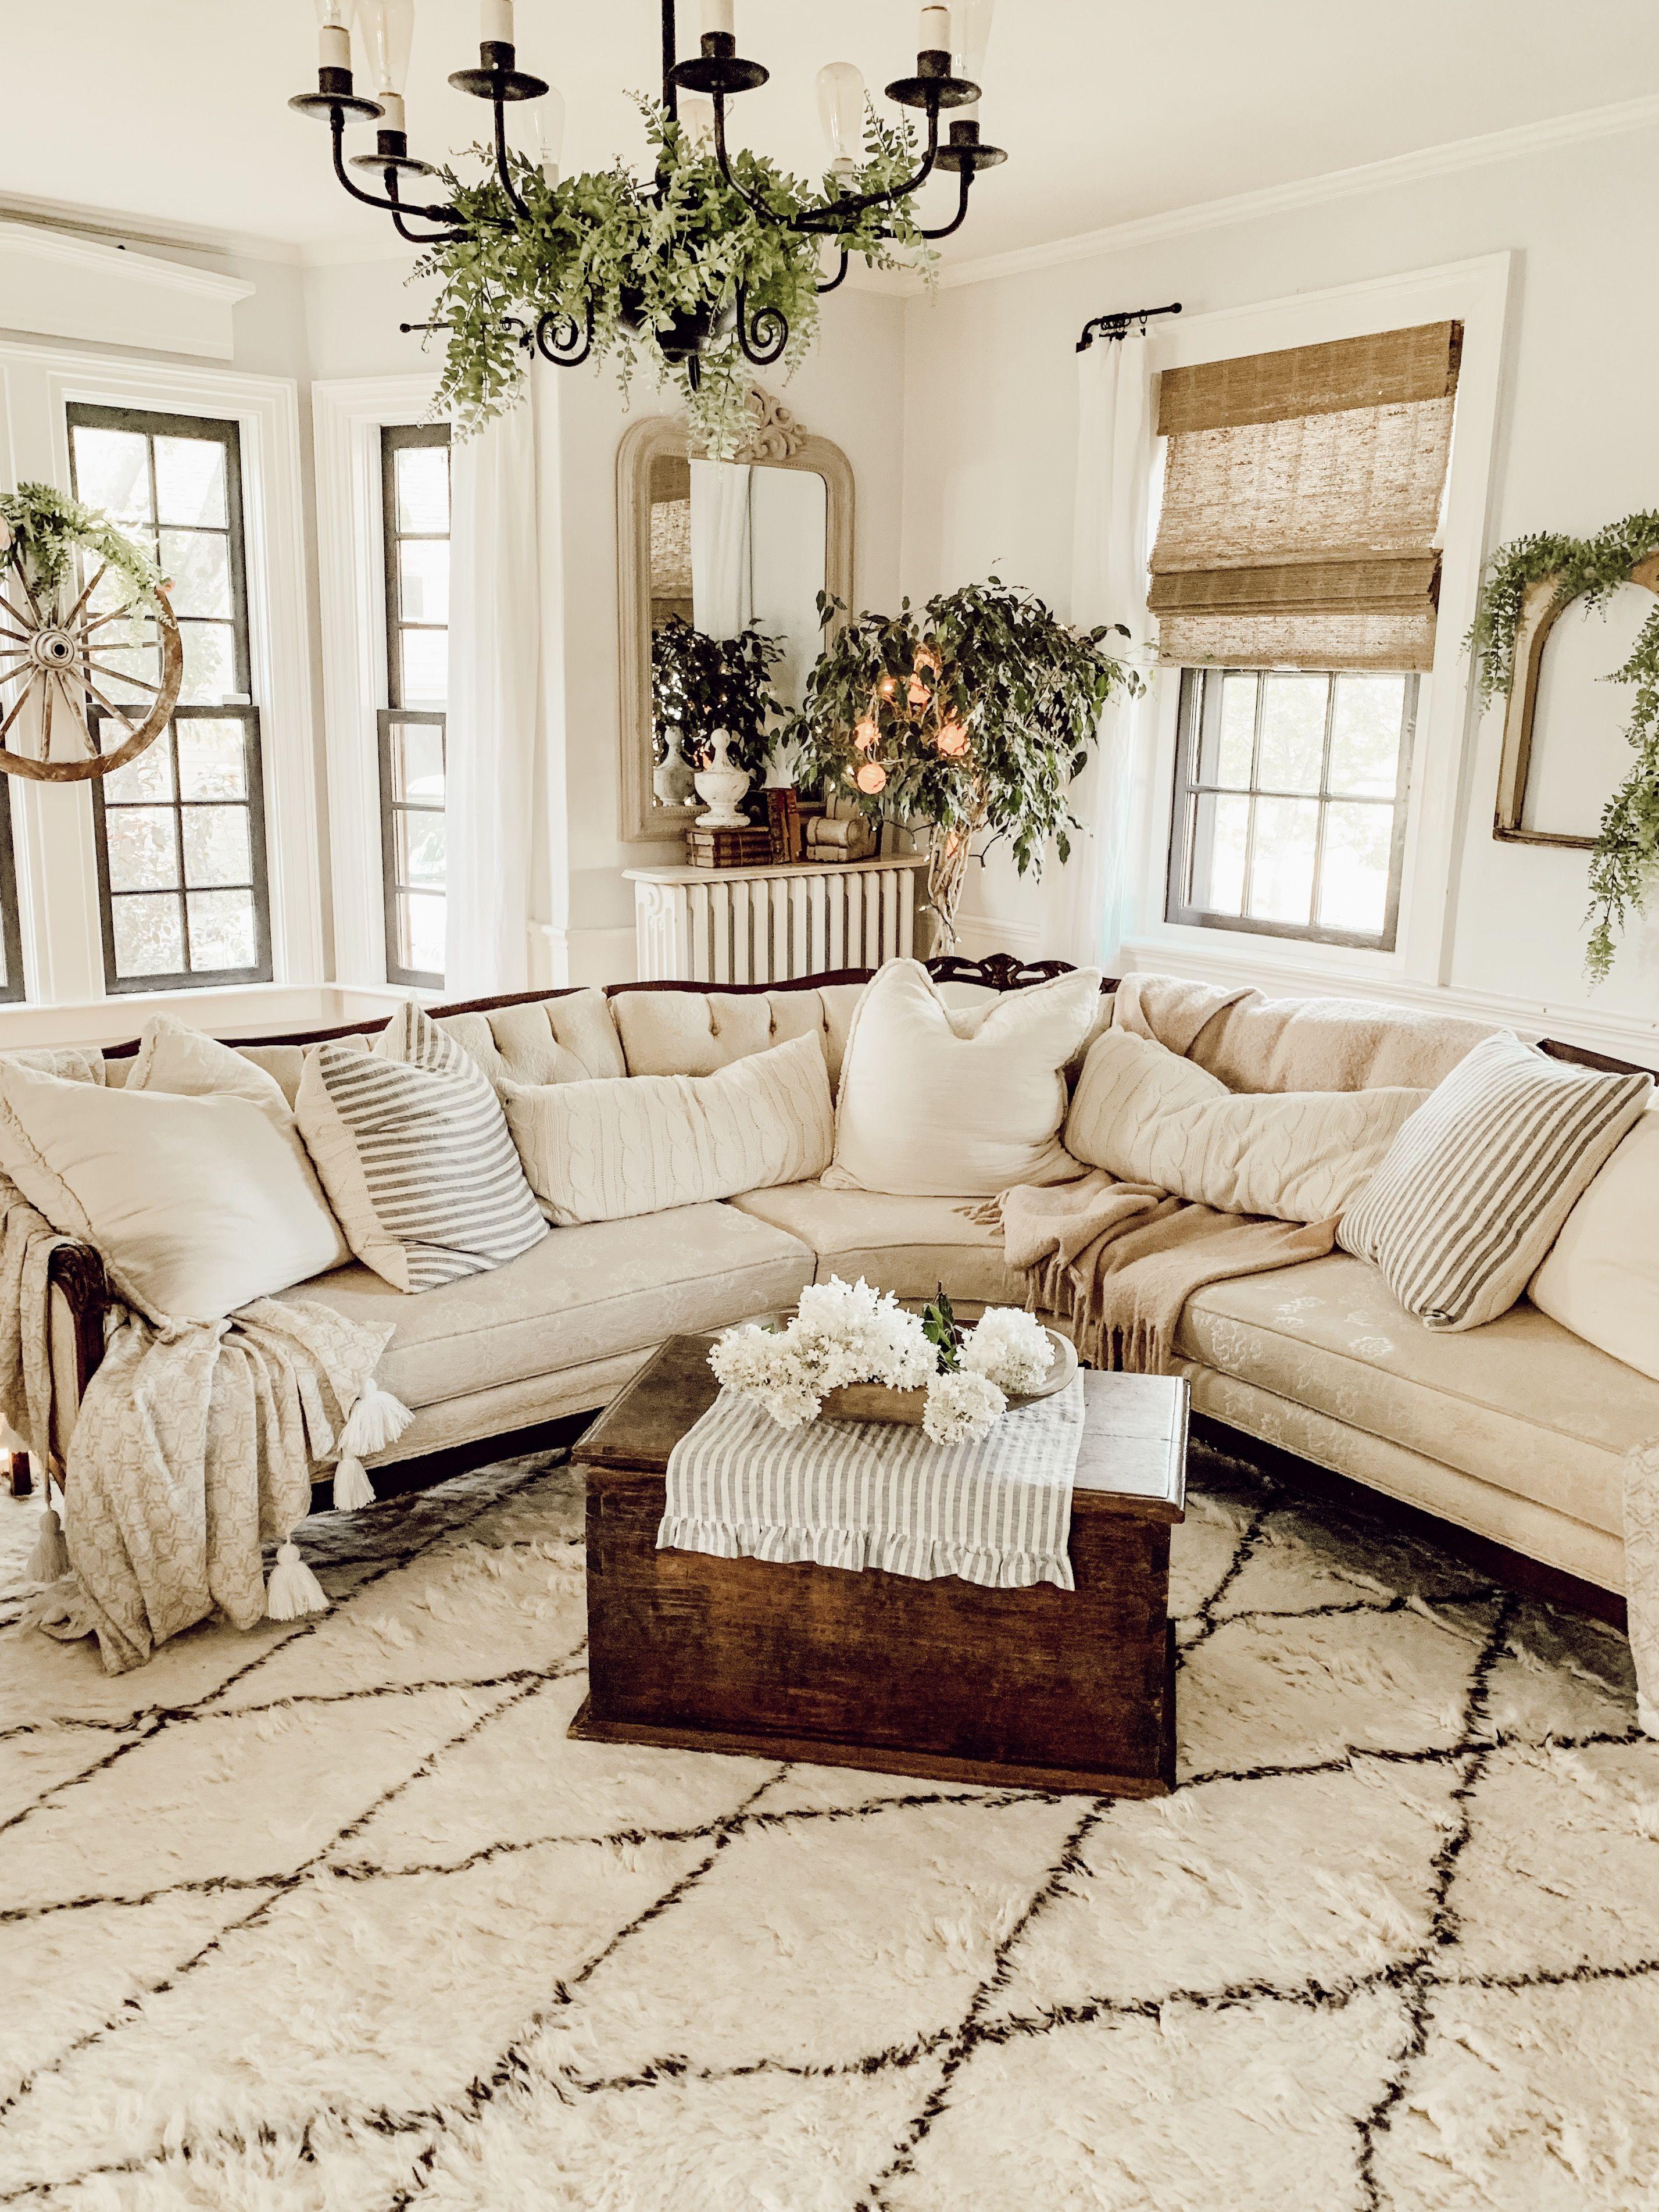 Rustic vintage farmhouse living room cozy home  Farm house living